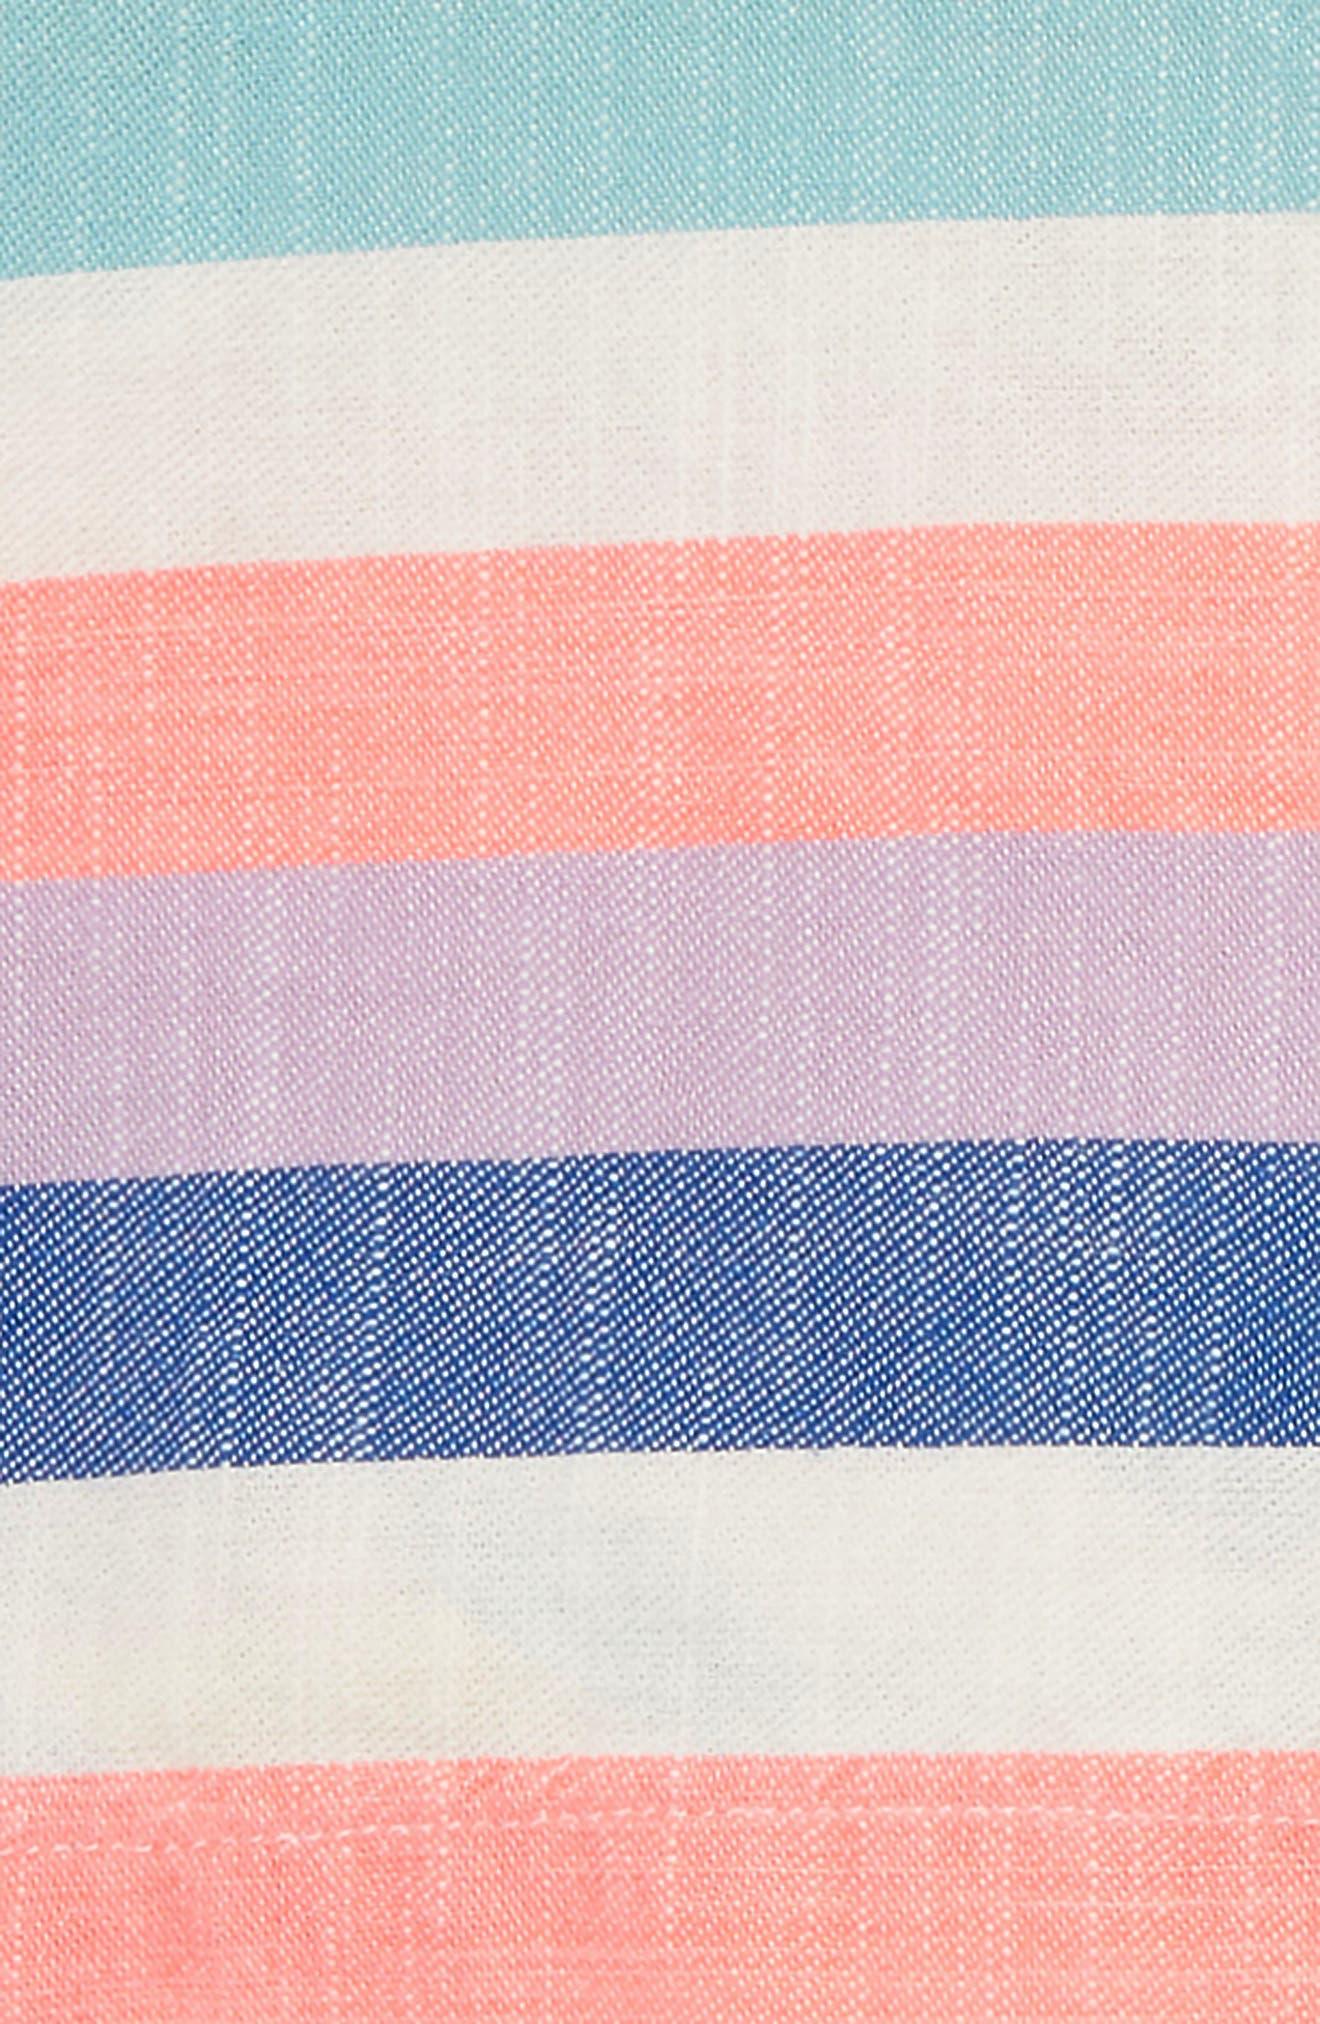 Bright Adventure Shorts,                             Alternate thumbnail 2, color,                             Candy Stripe Mul